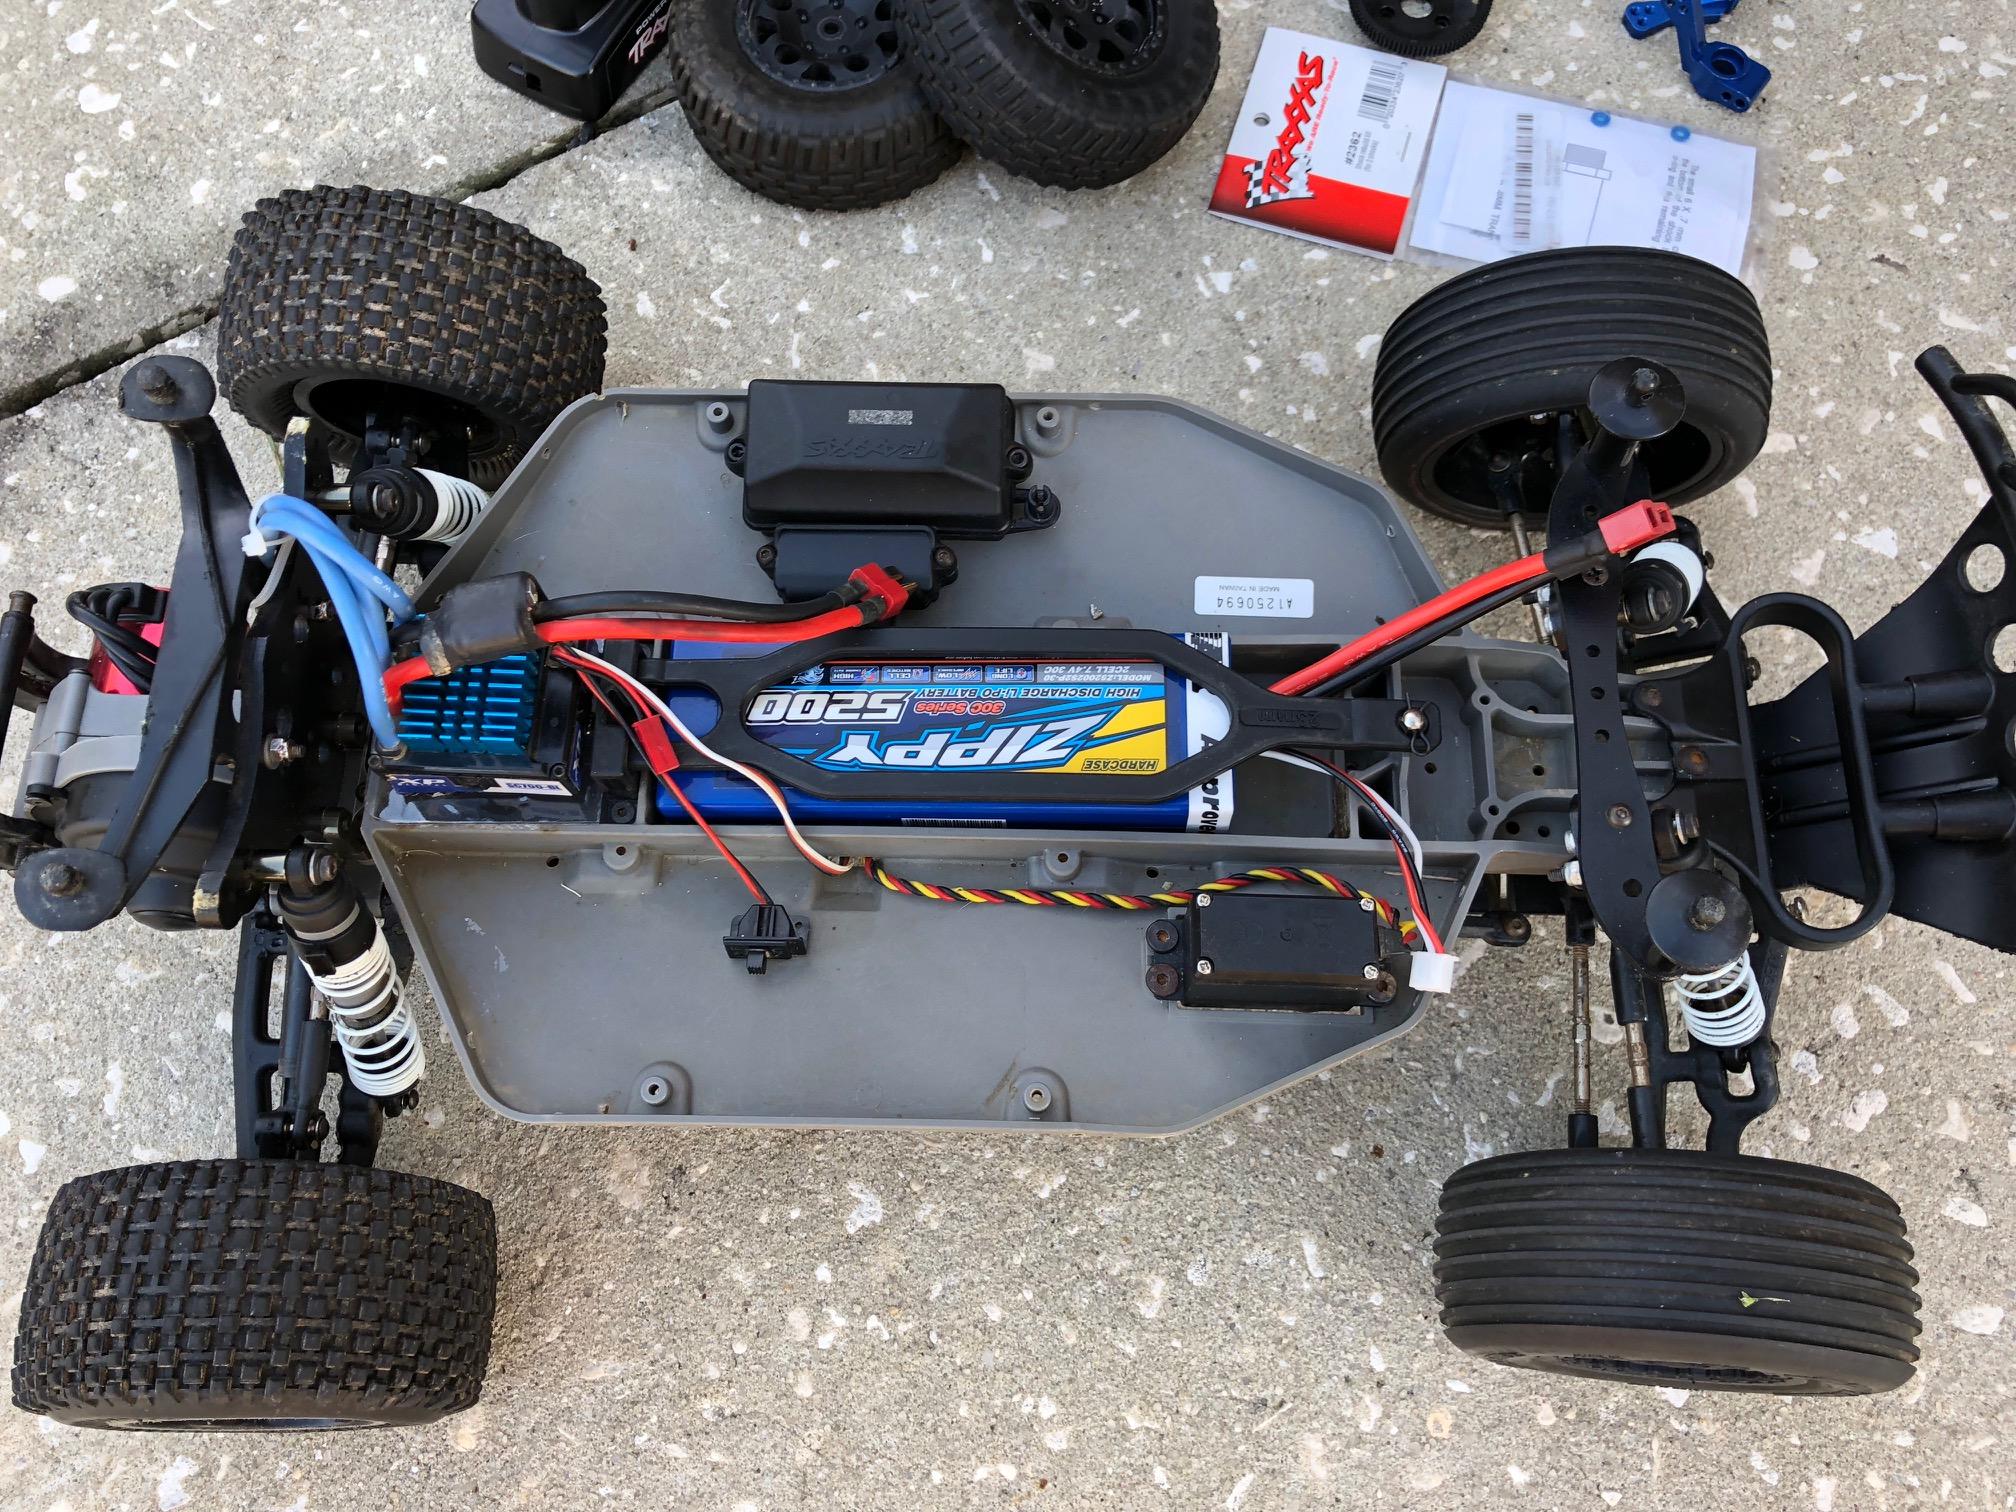 Traxxas Slash 2wd Bug Upgraded - R/C Tech Forums